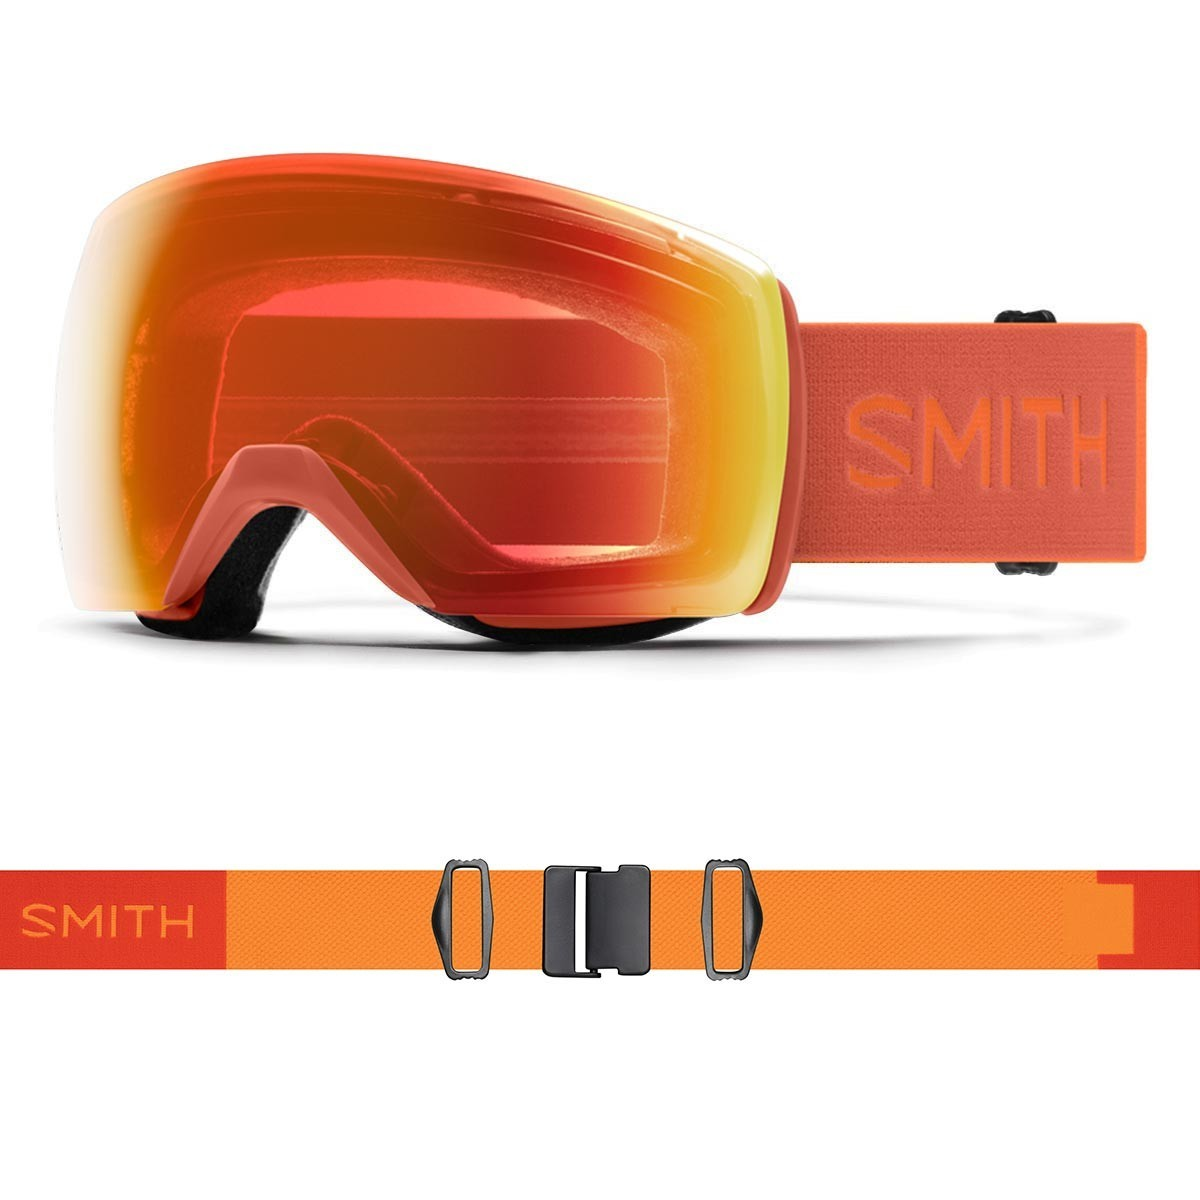 SMITH SKYLINE XL burnt orange | S2 CHROMAPOP Everyday Red Mirror - Изображение - AQUAMATRIX